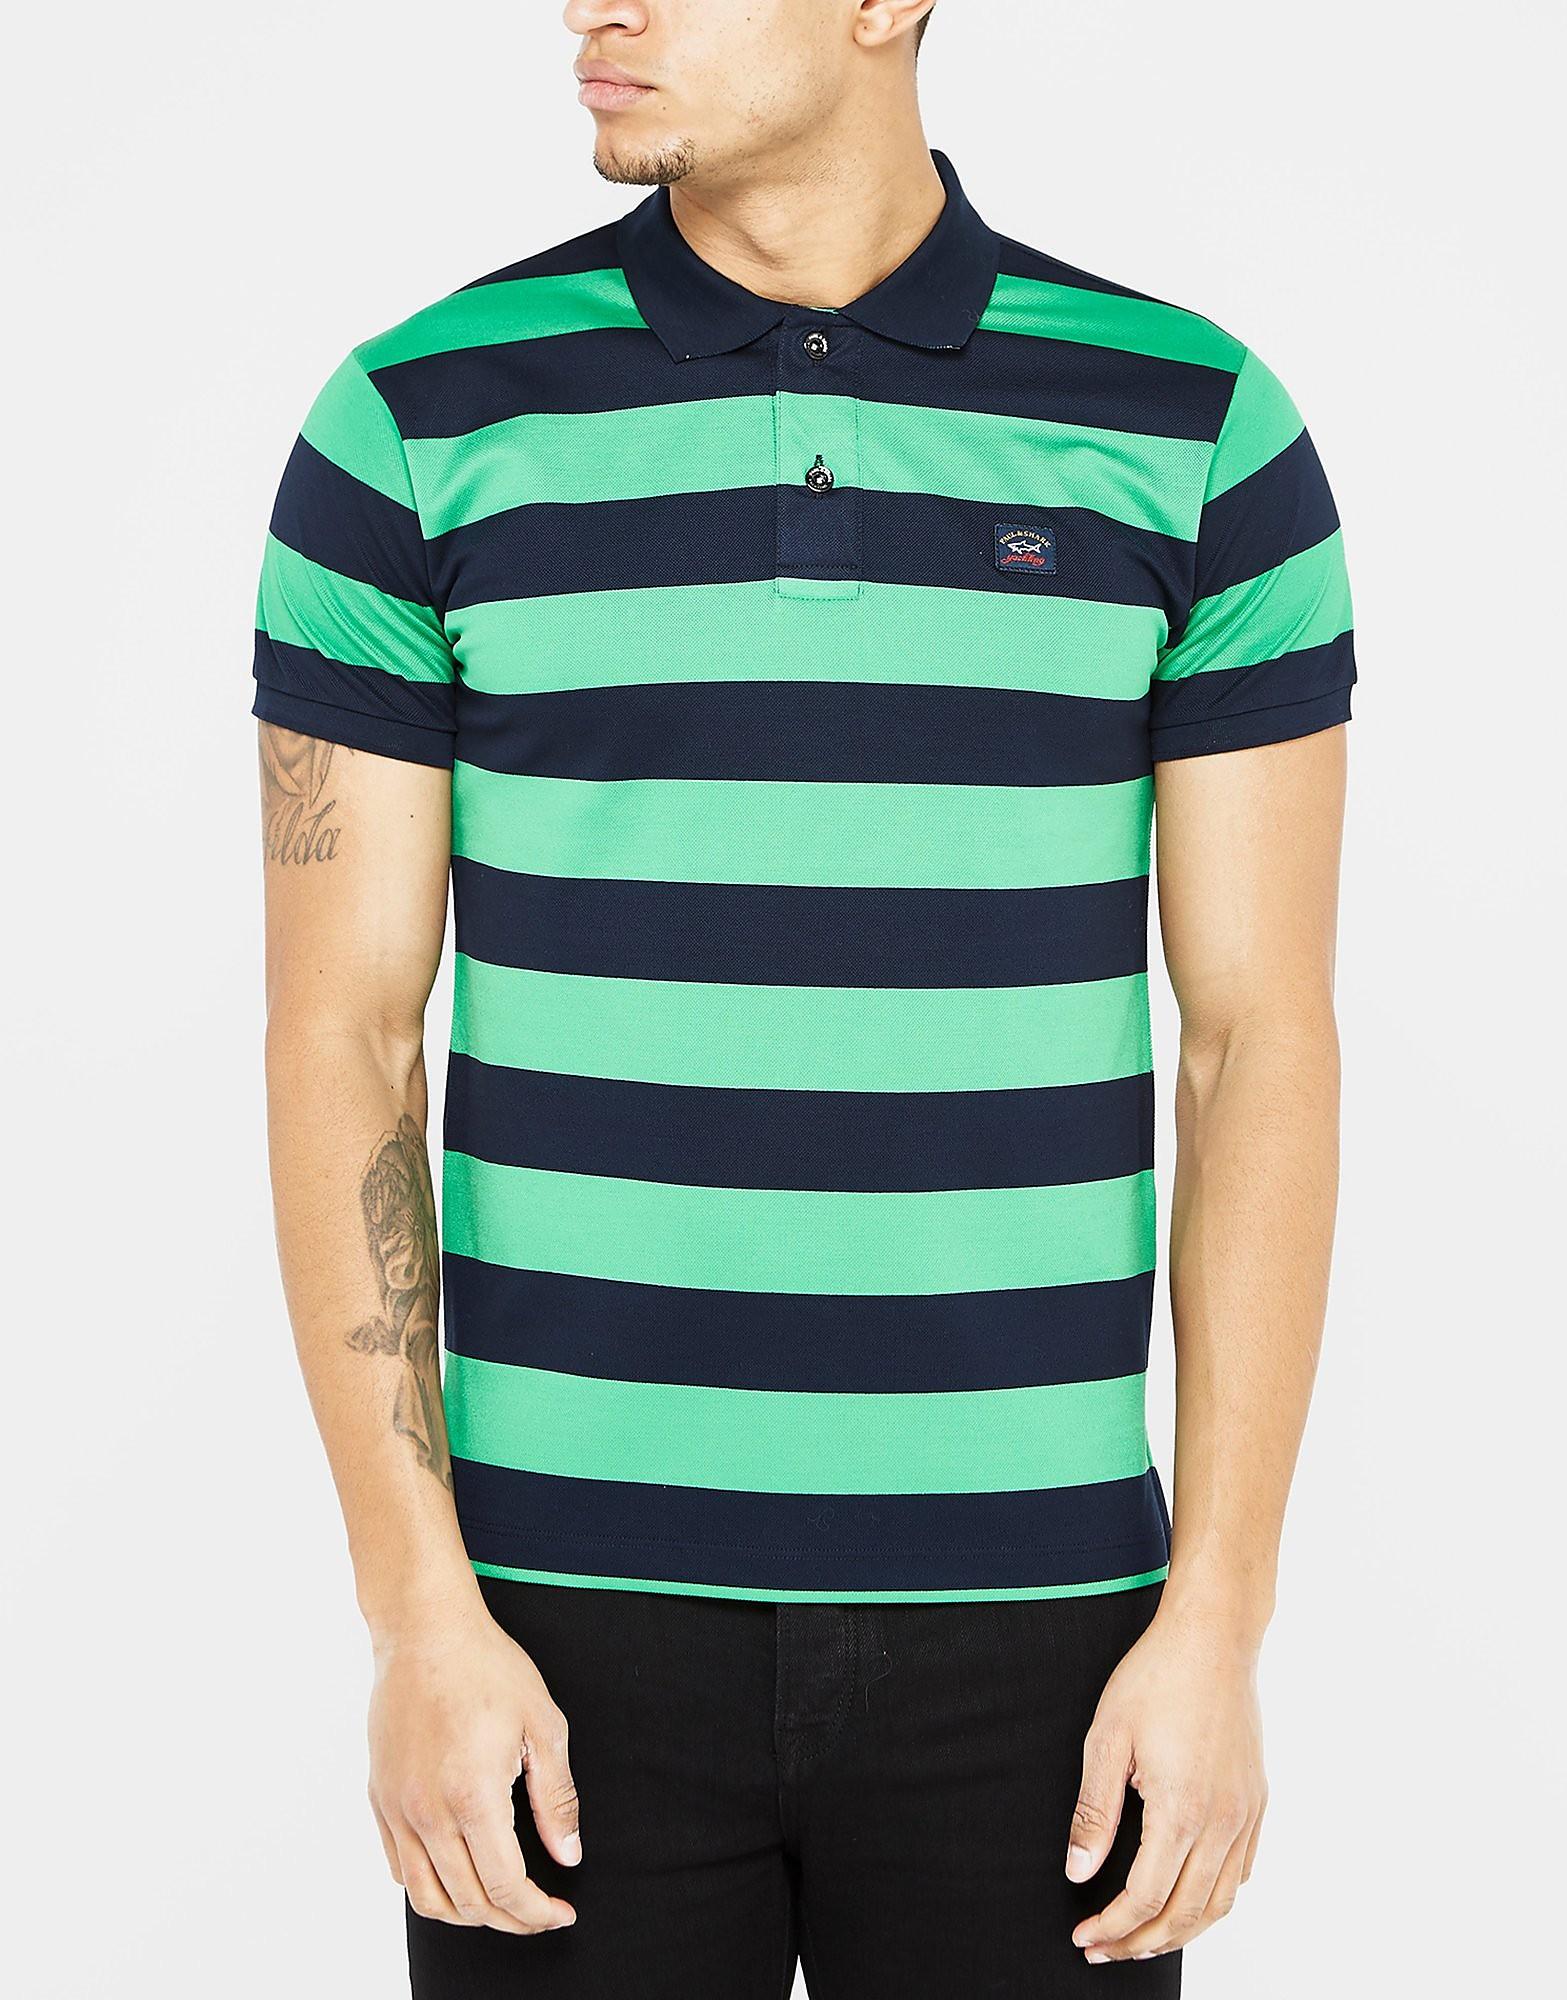 Paul & Shark Black Stripe Polo Shirt